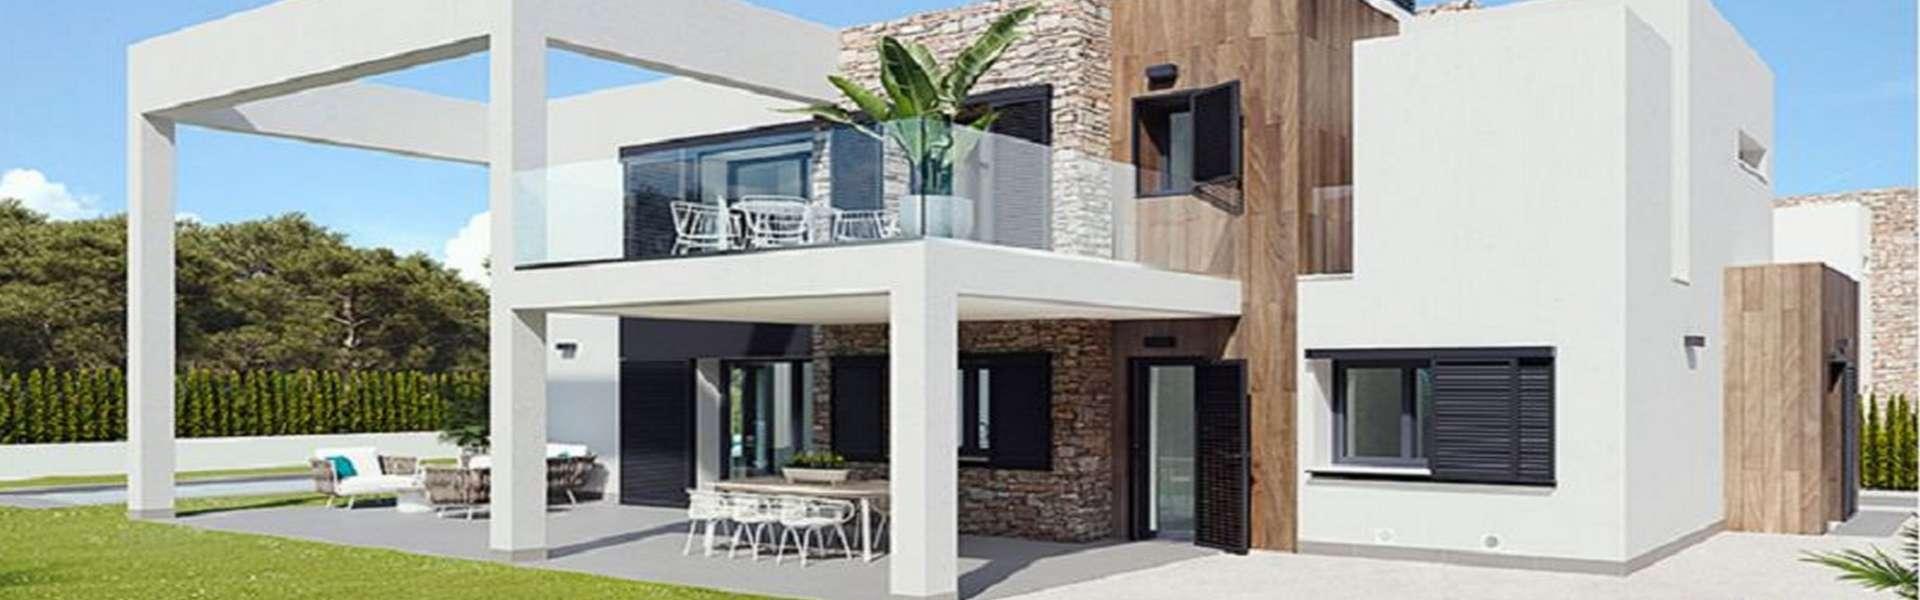 Cala Murada - Neubau Villen in Top-Lage